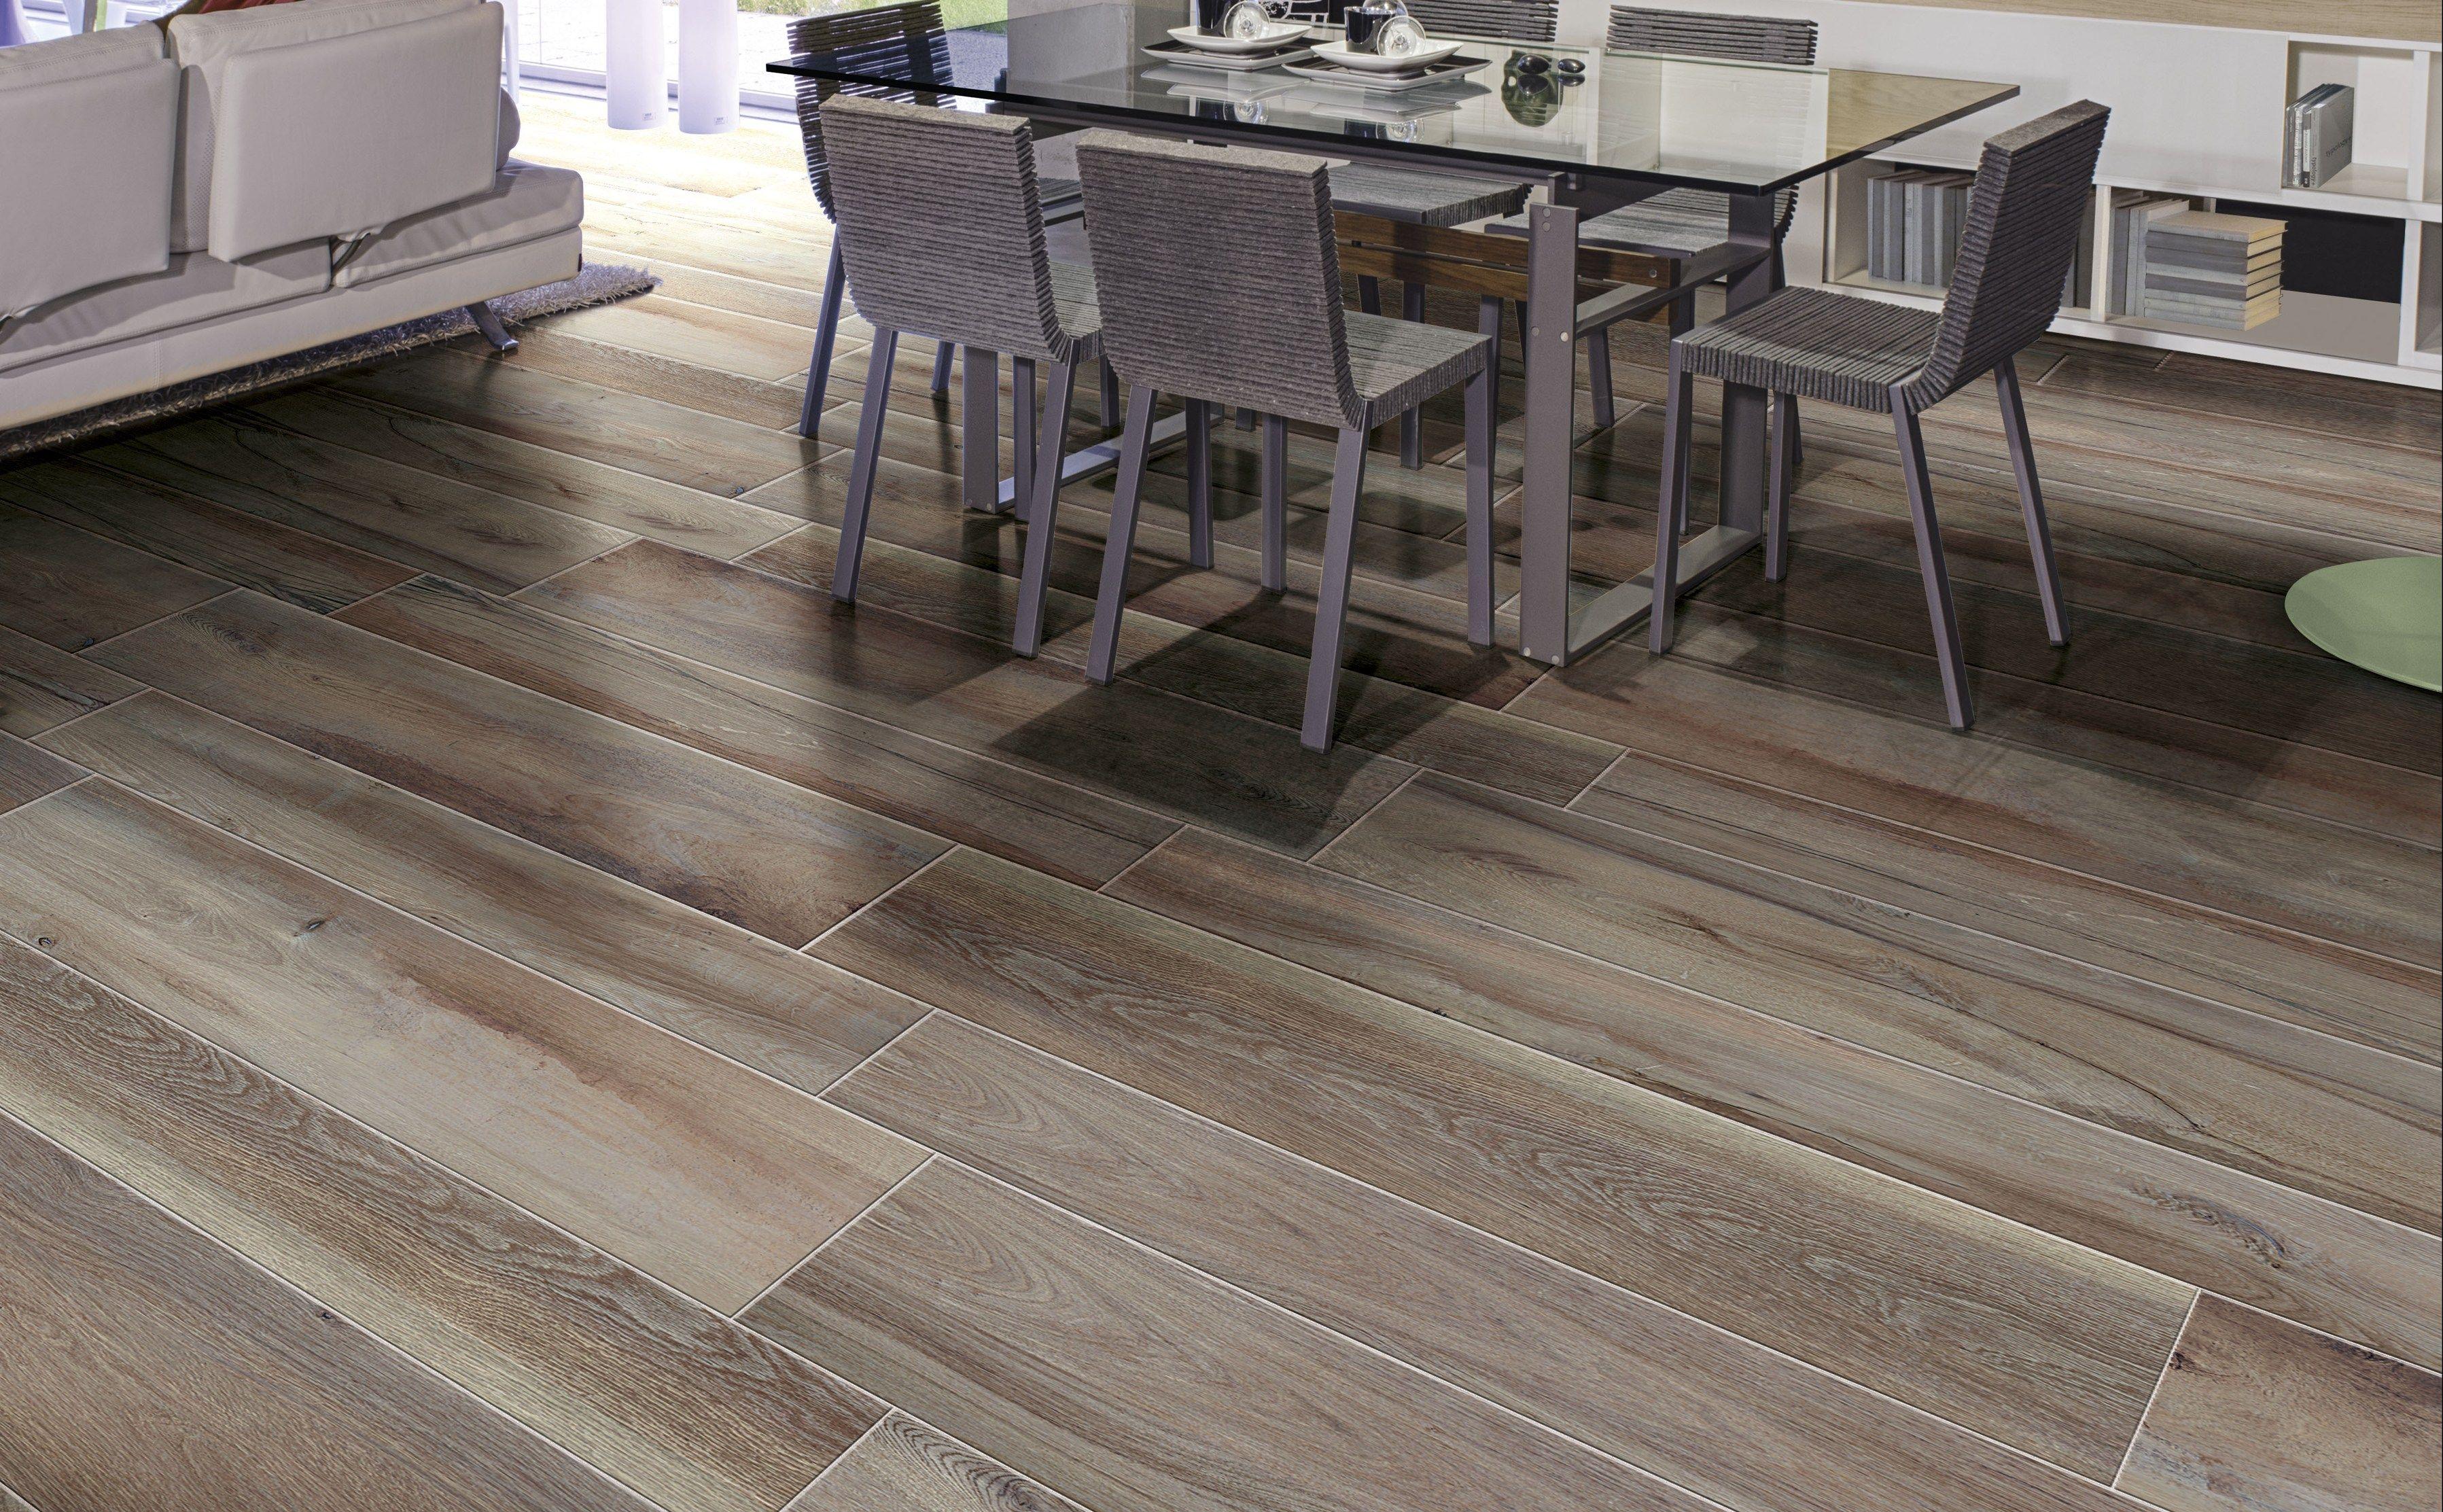 Pavimento effetto legno sherwood nut collezione sherwood by ...